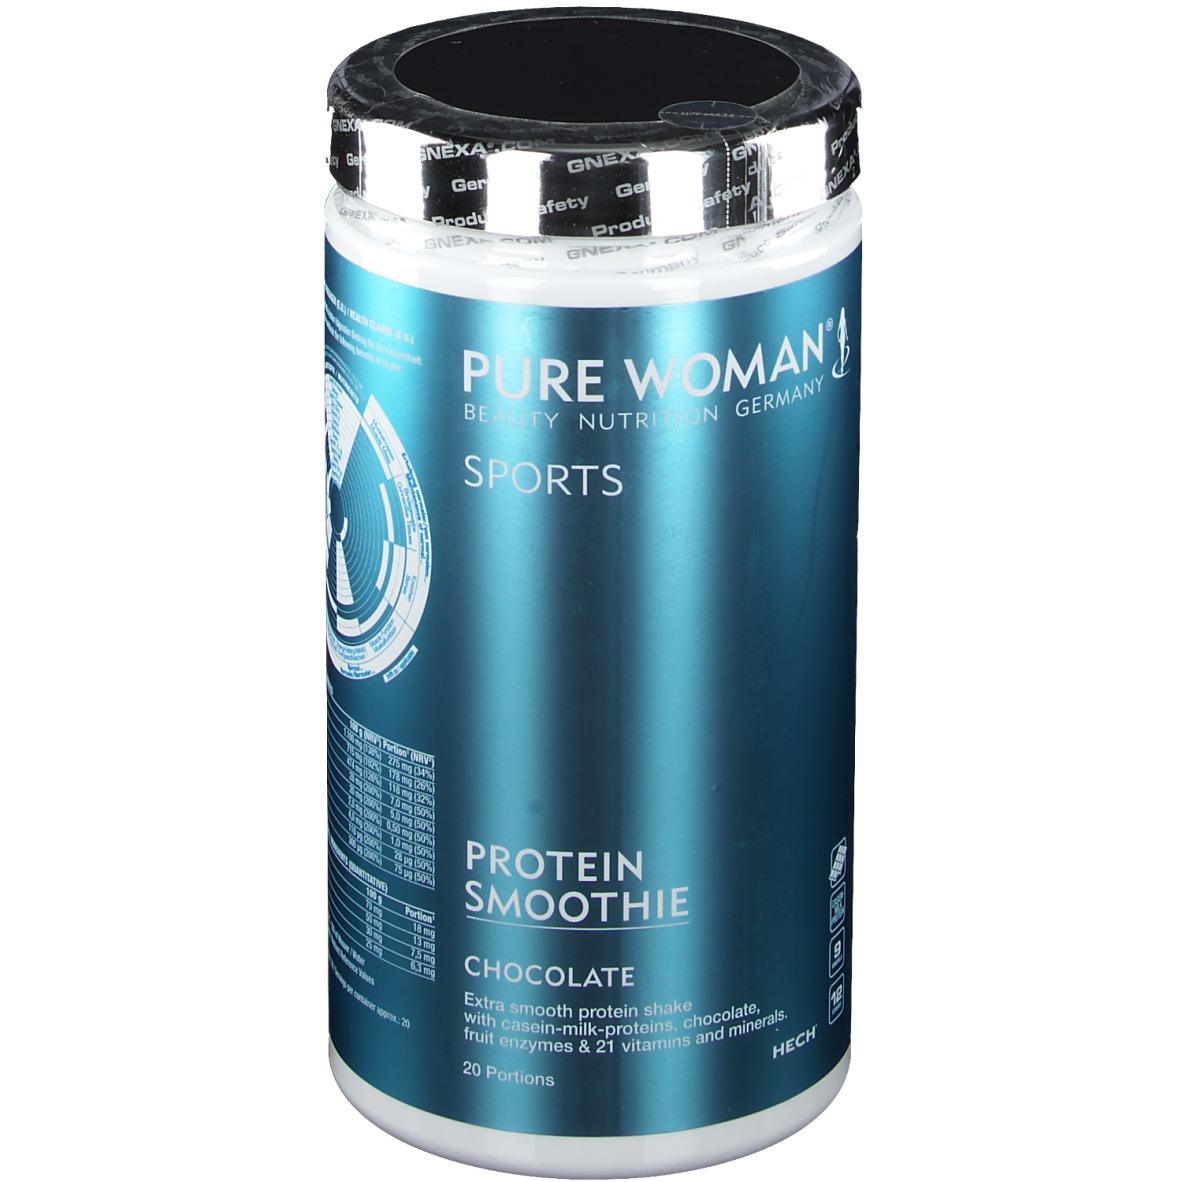 HECH® Pure Woman® Sports Protein Smoothie Schokolade 500 g Pulver 12668430